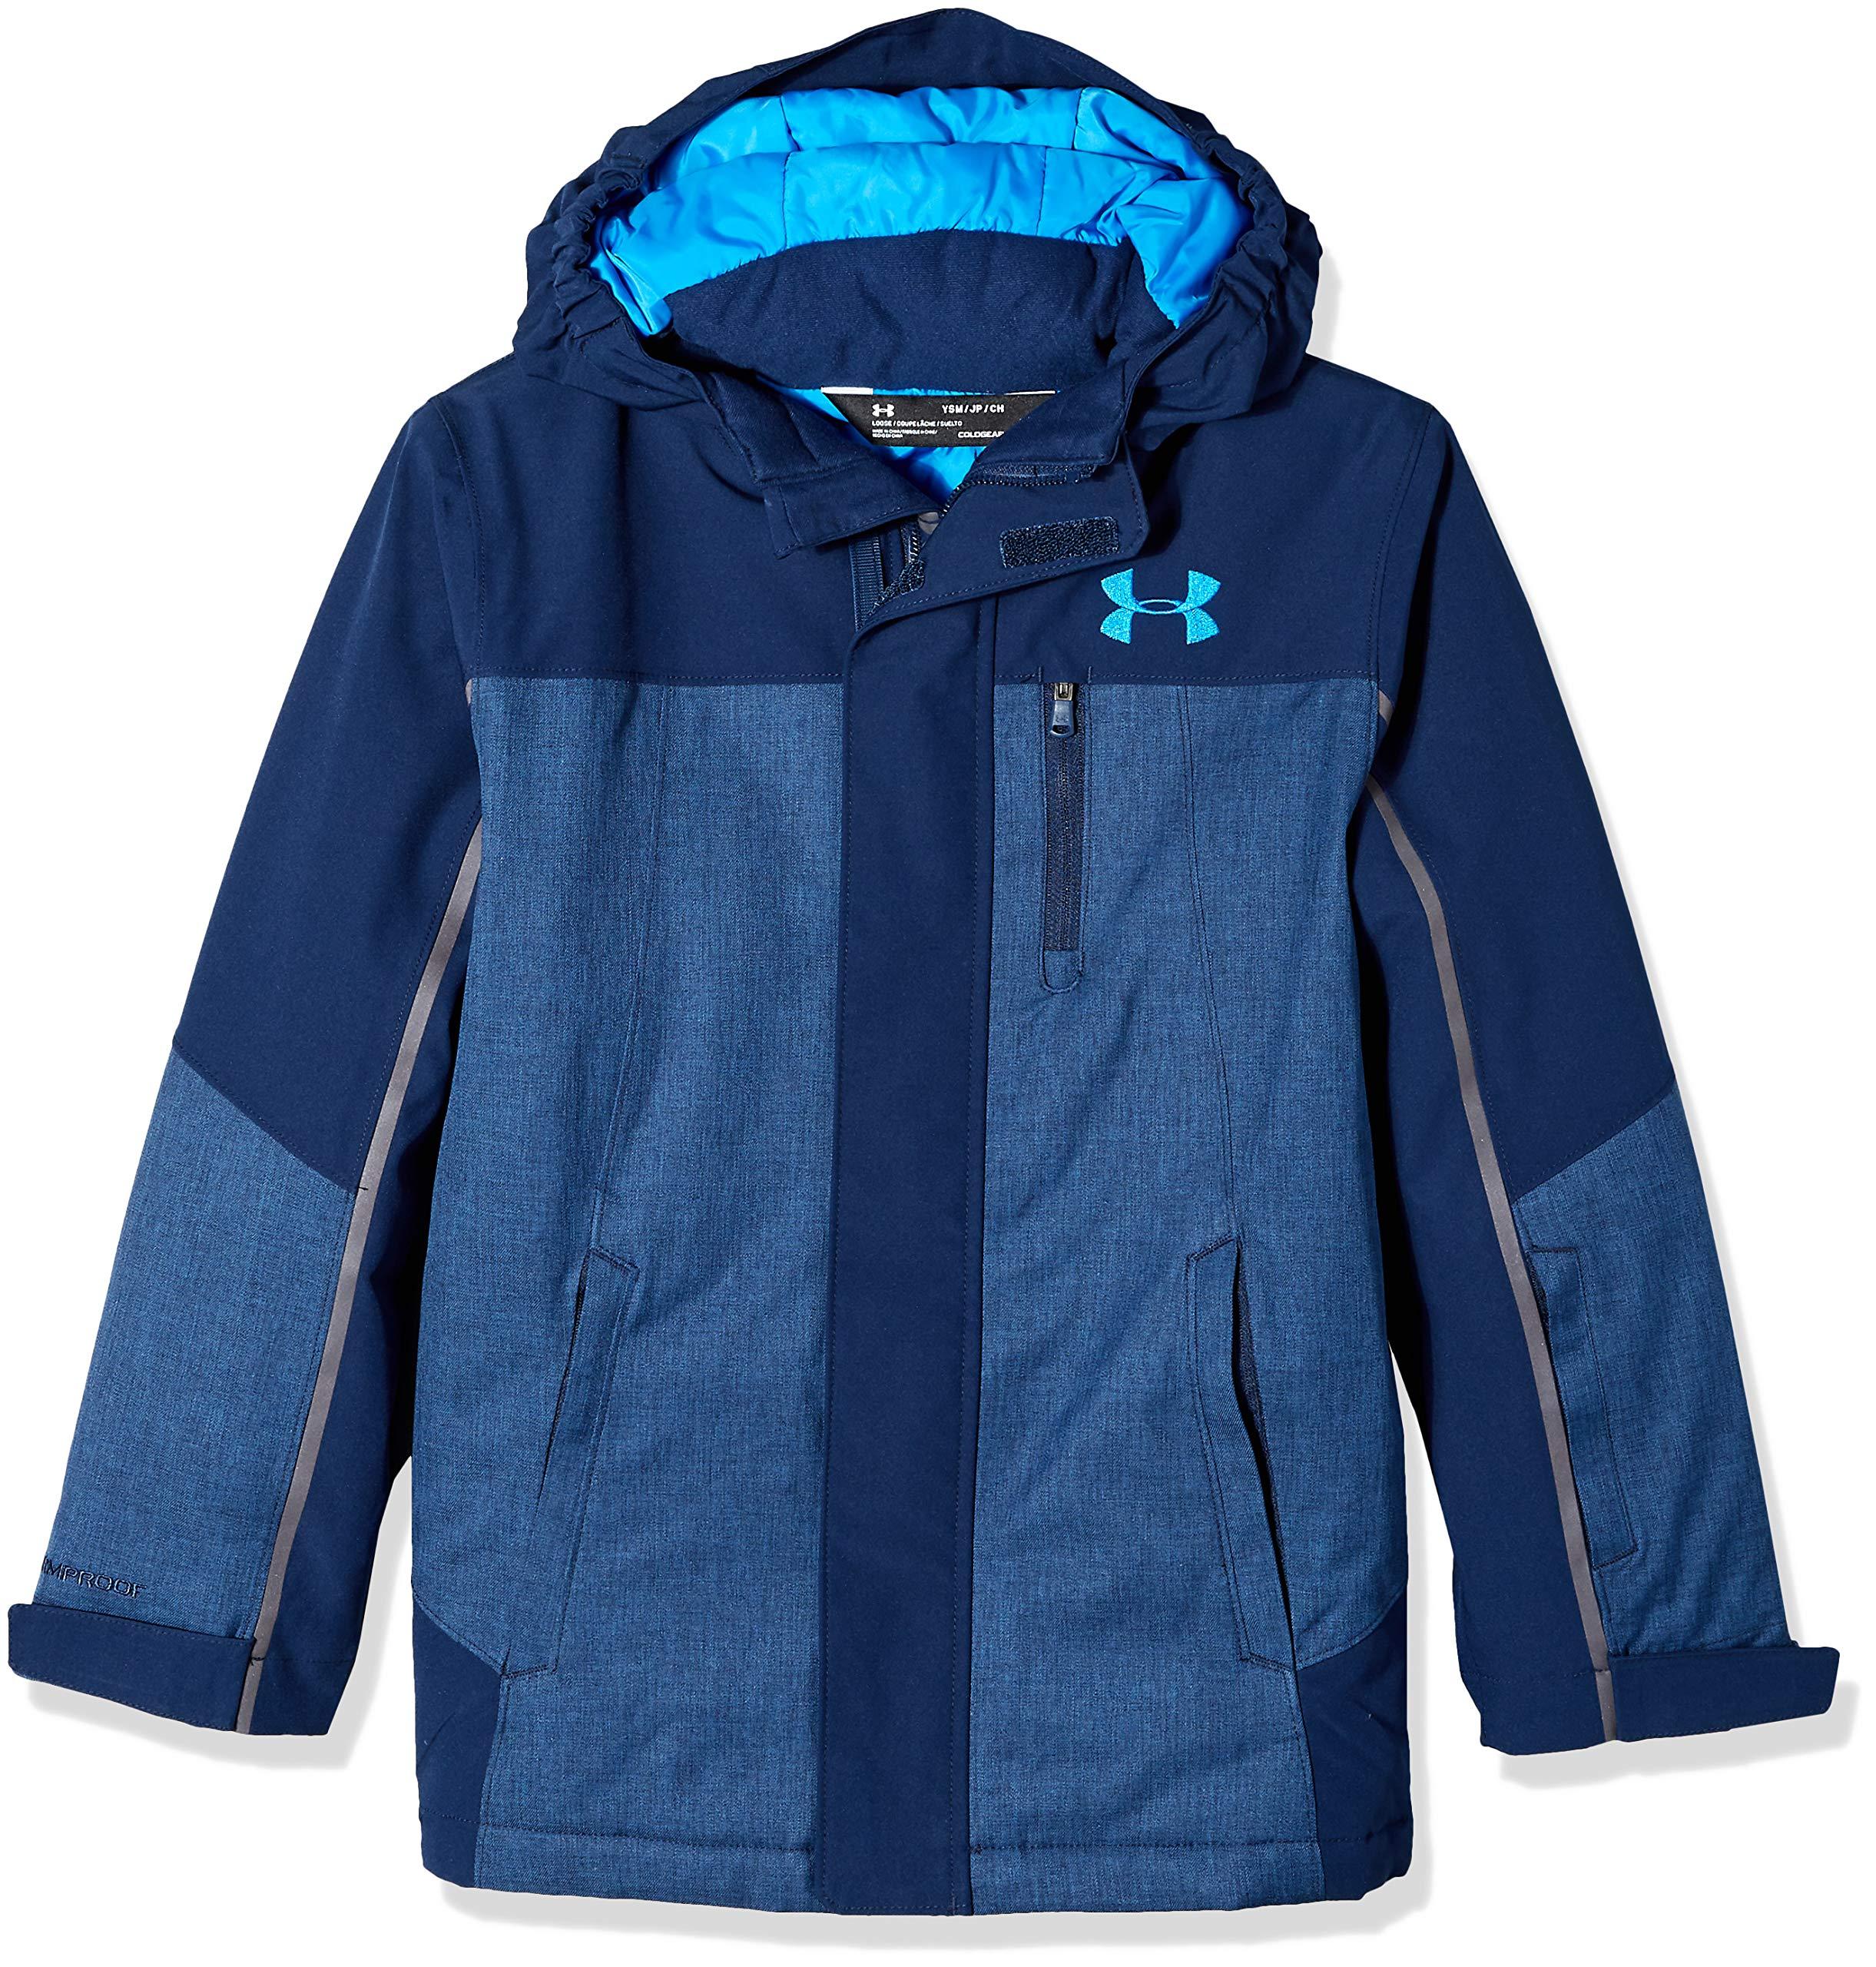 Under Armour Boys' Big Castlerock Jacket, Academy Small (8)